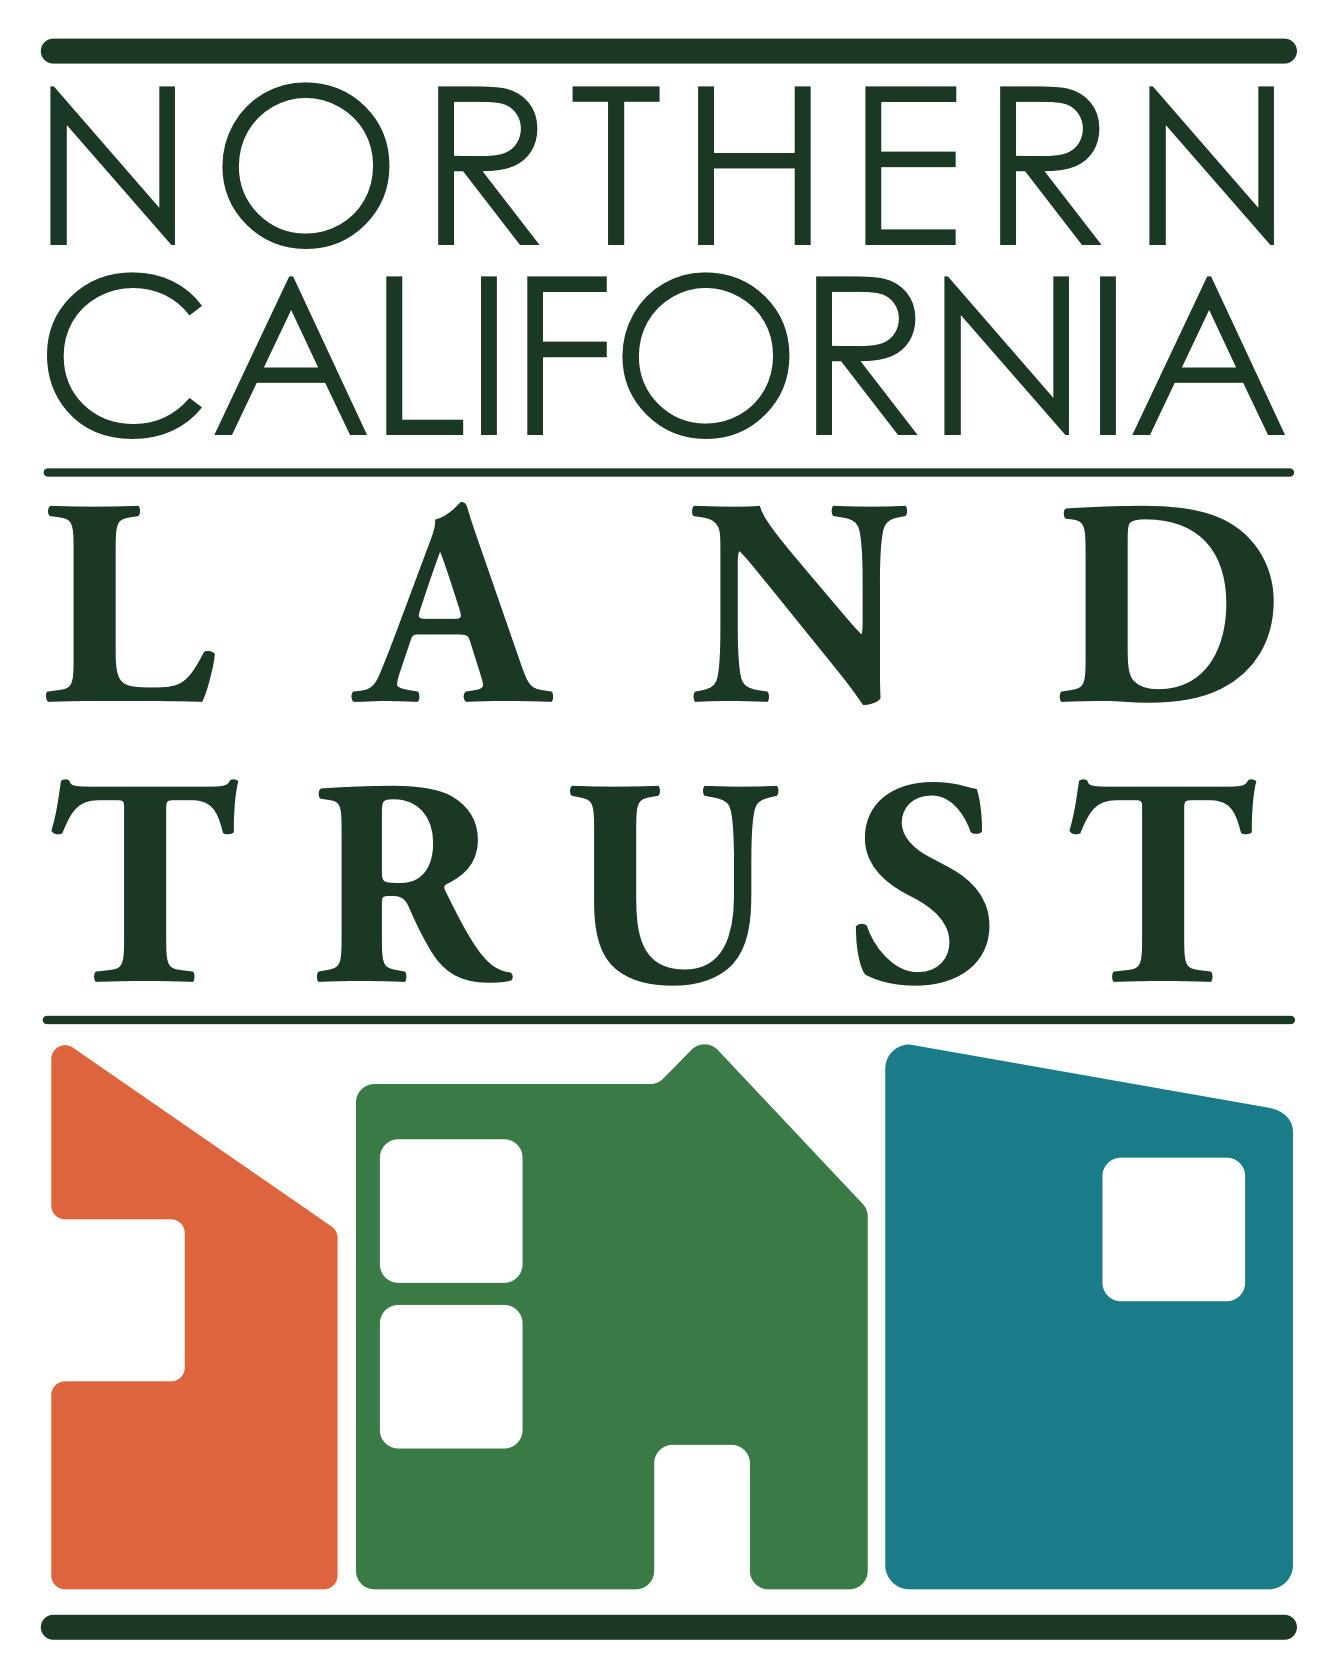 Northern California Land Trust (NCLT) logo